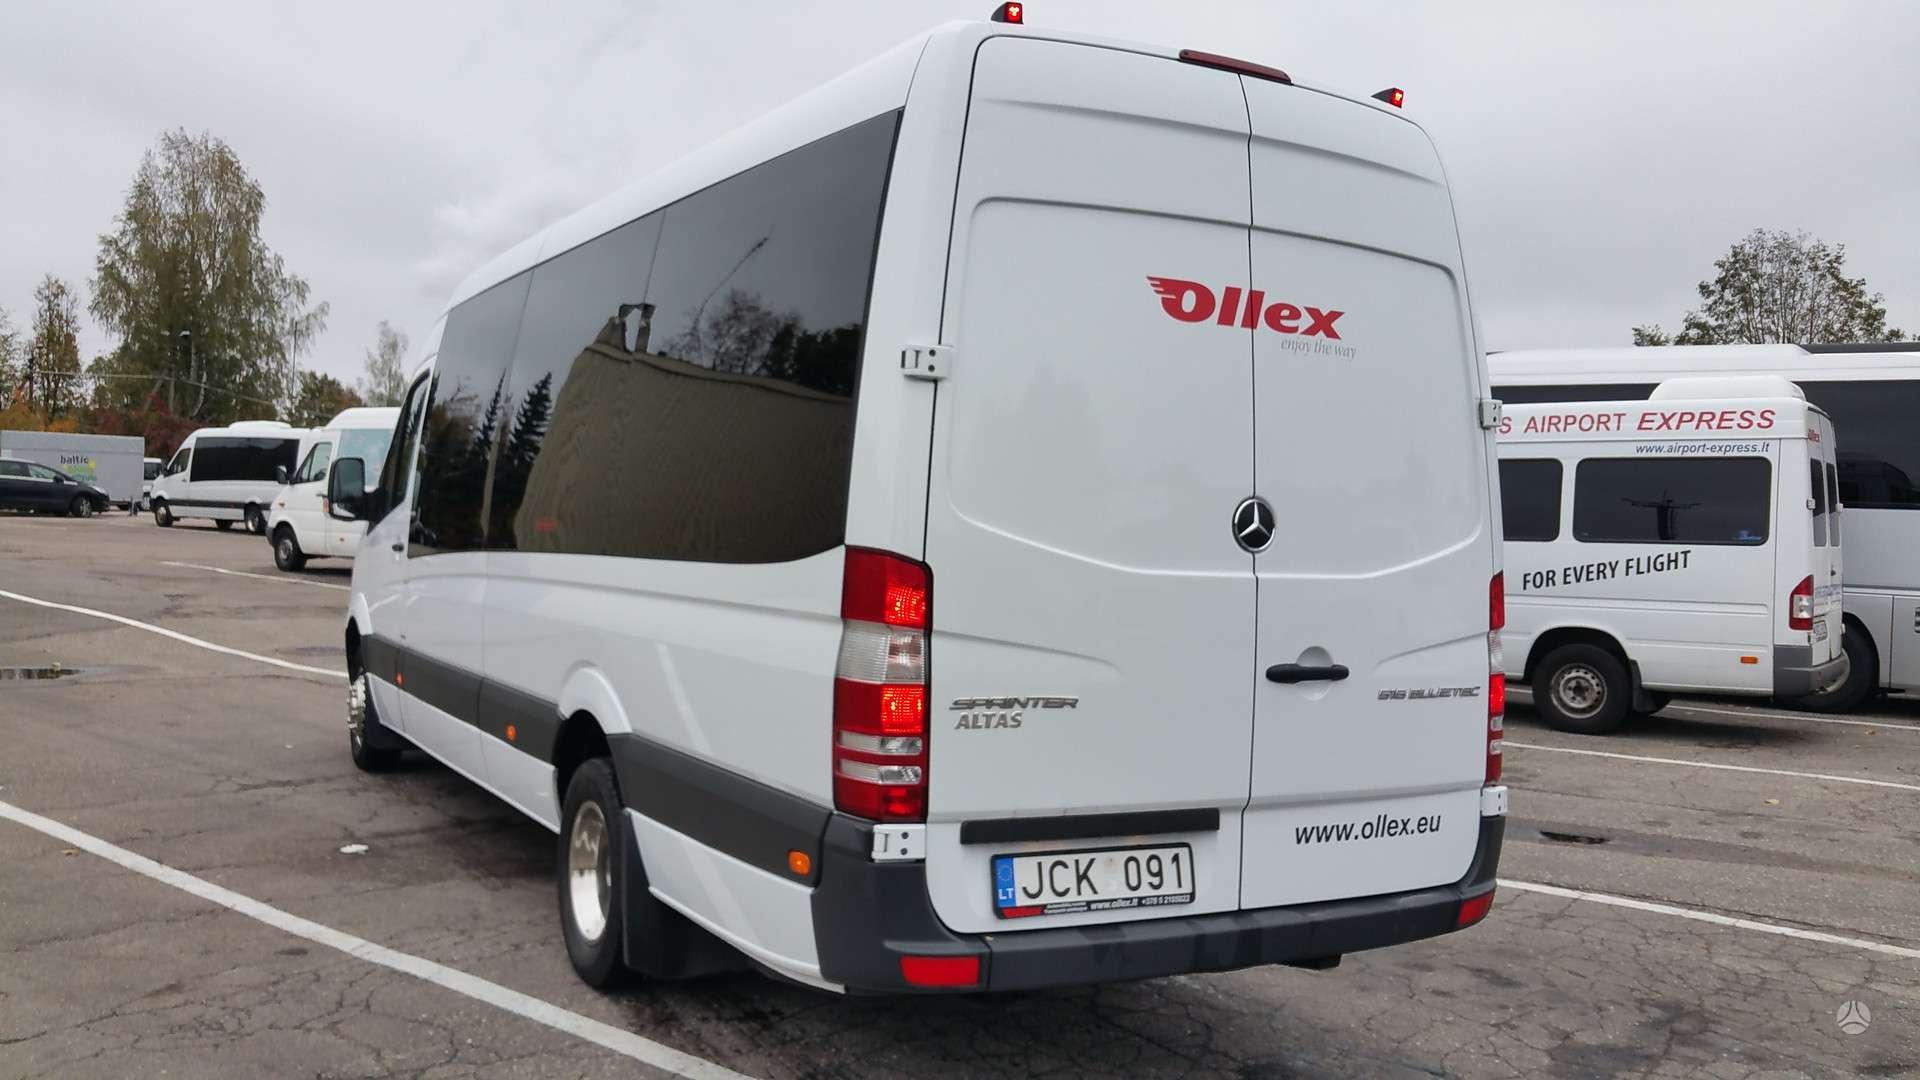 Mercedes benz sprinter altas passenger from 3 5 t up to 5 t 2016 m a4990328 autoplius lt